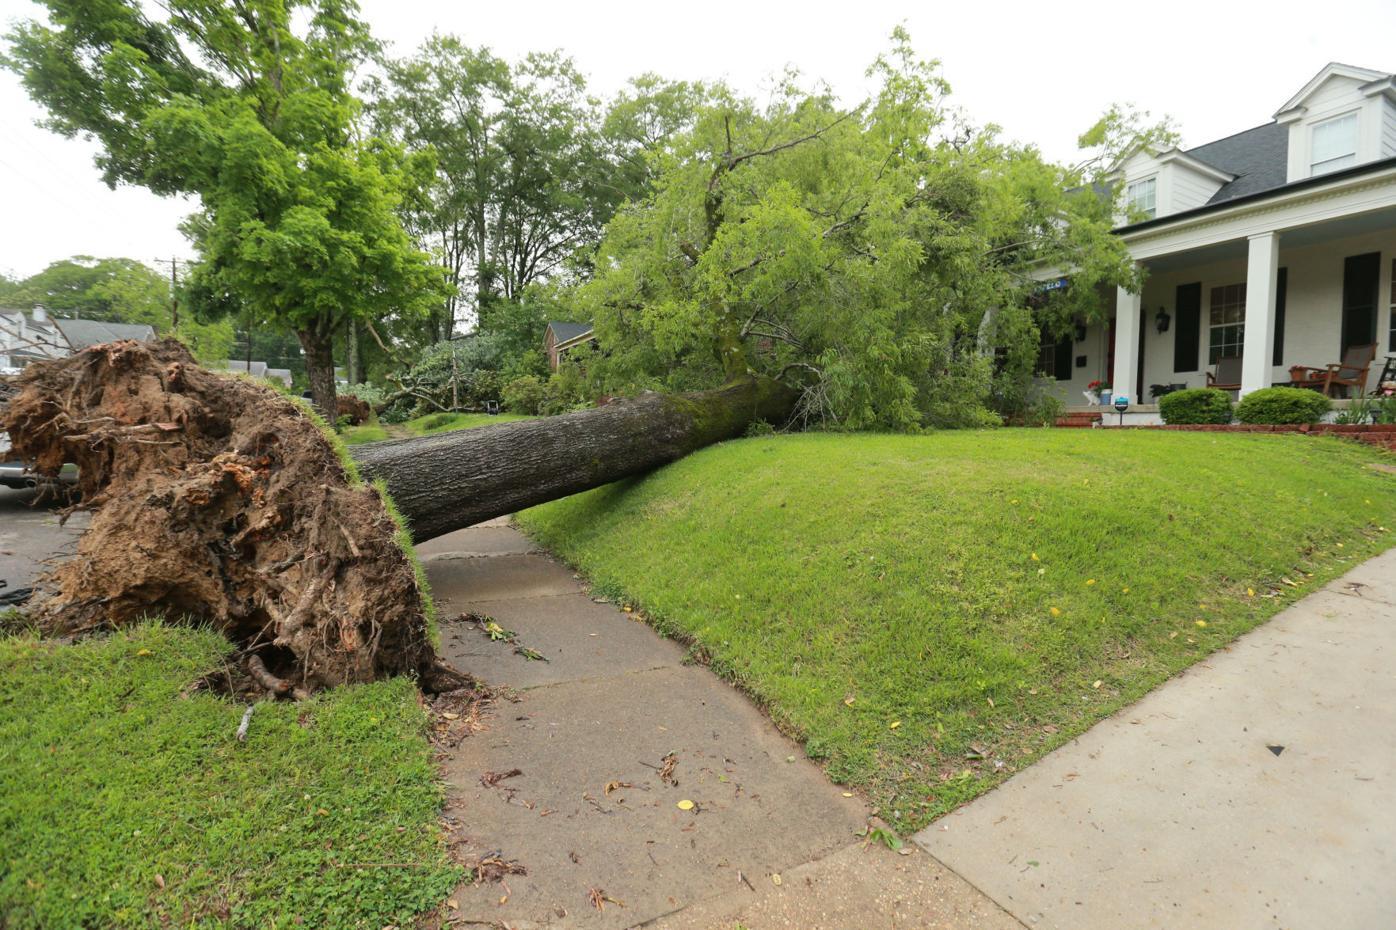 djr-2021-05-04-news-tornado-twp6